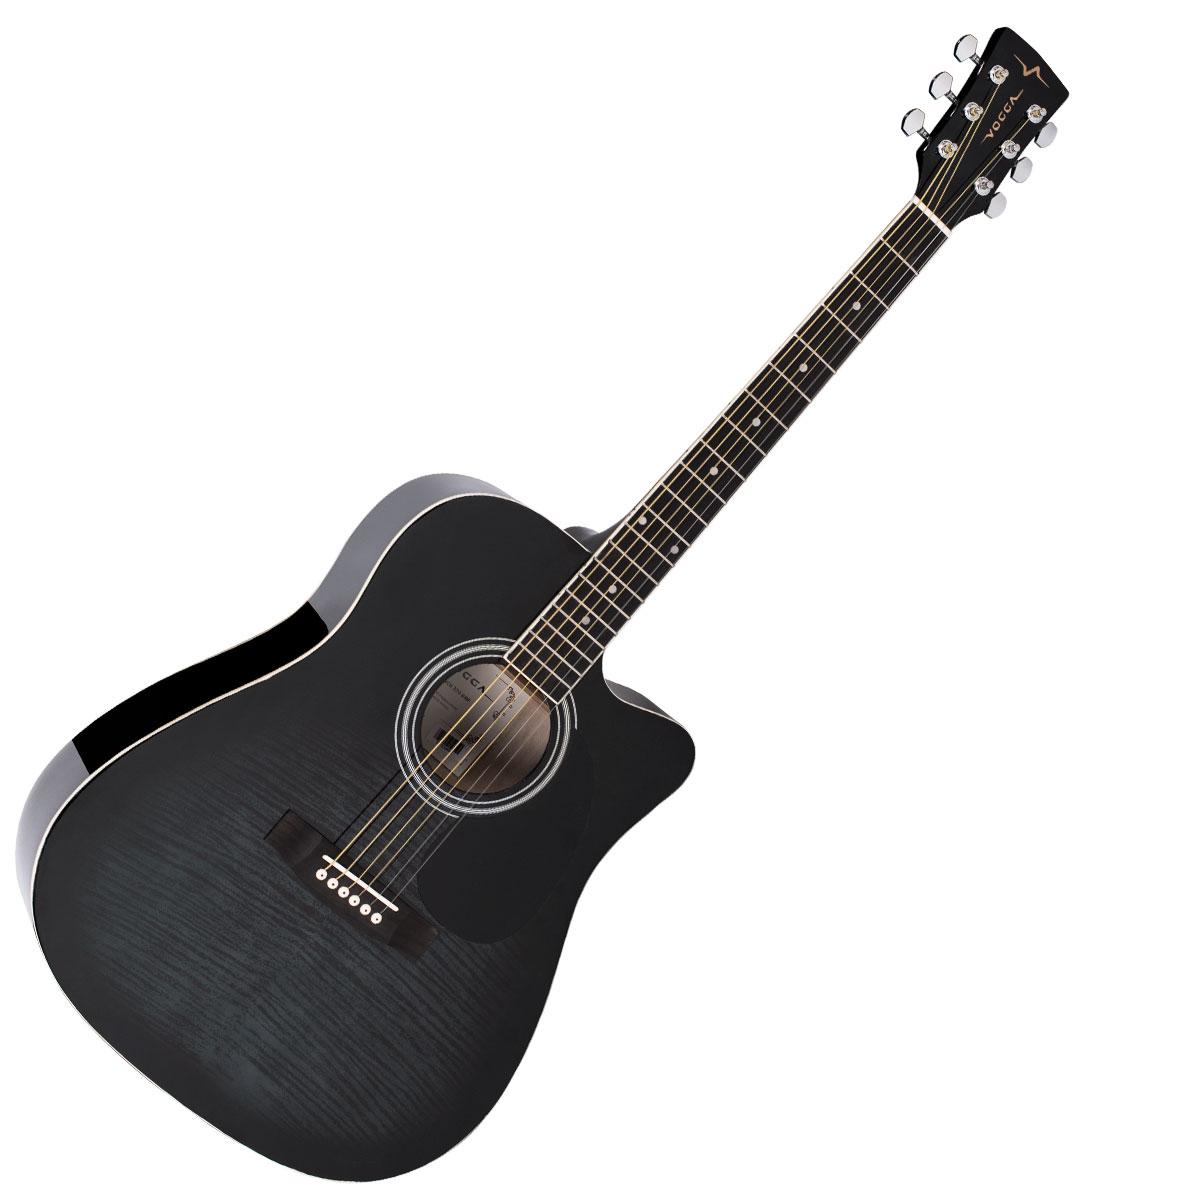 Violão Folk Cutaway Acústico VCK371 Black Maple Flamed - Vogga